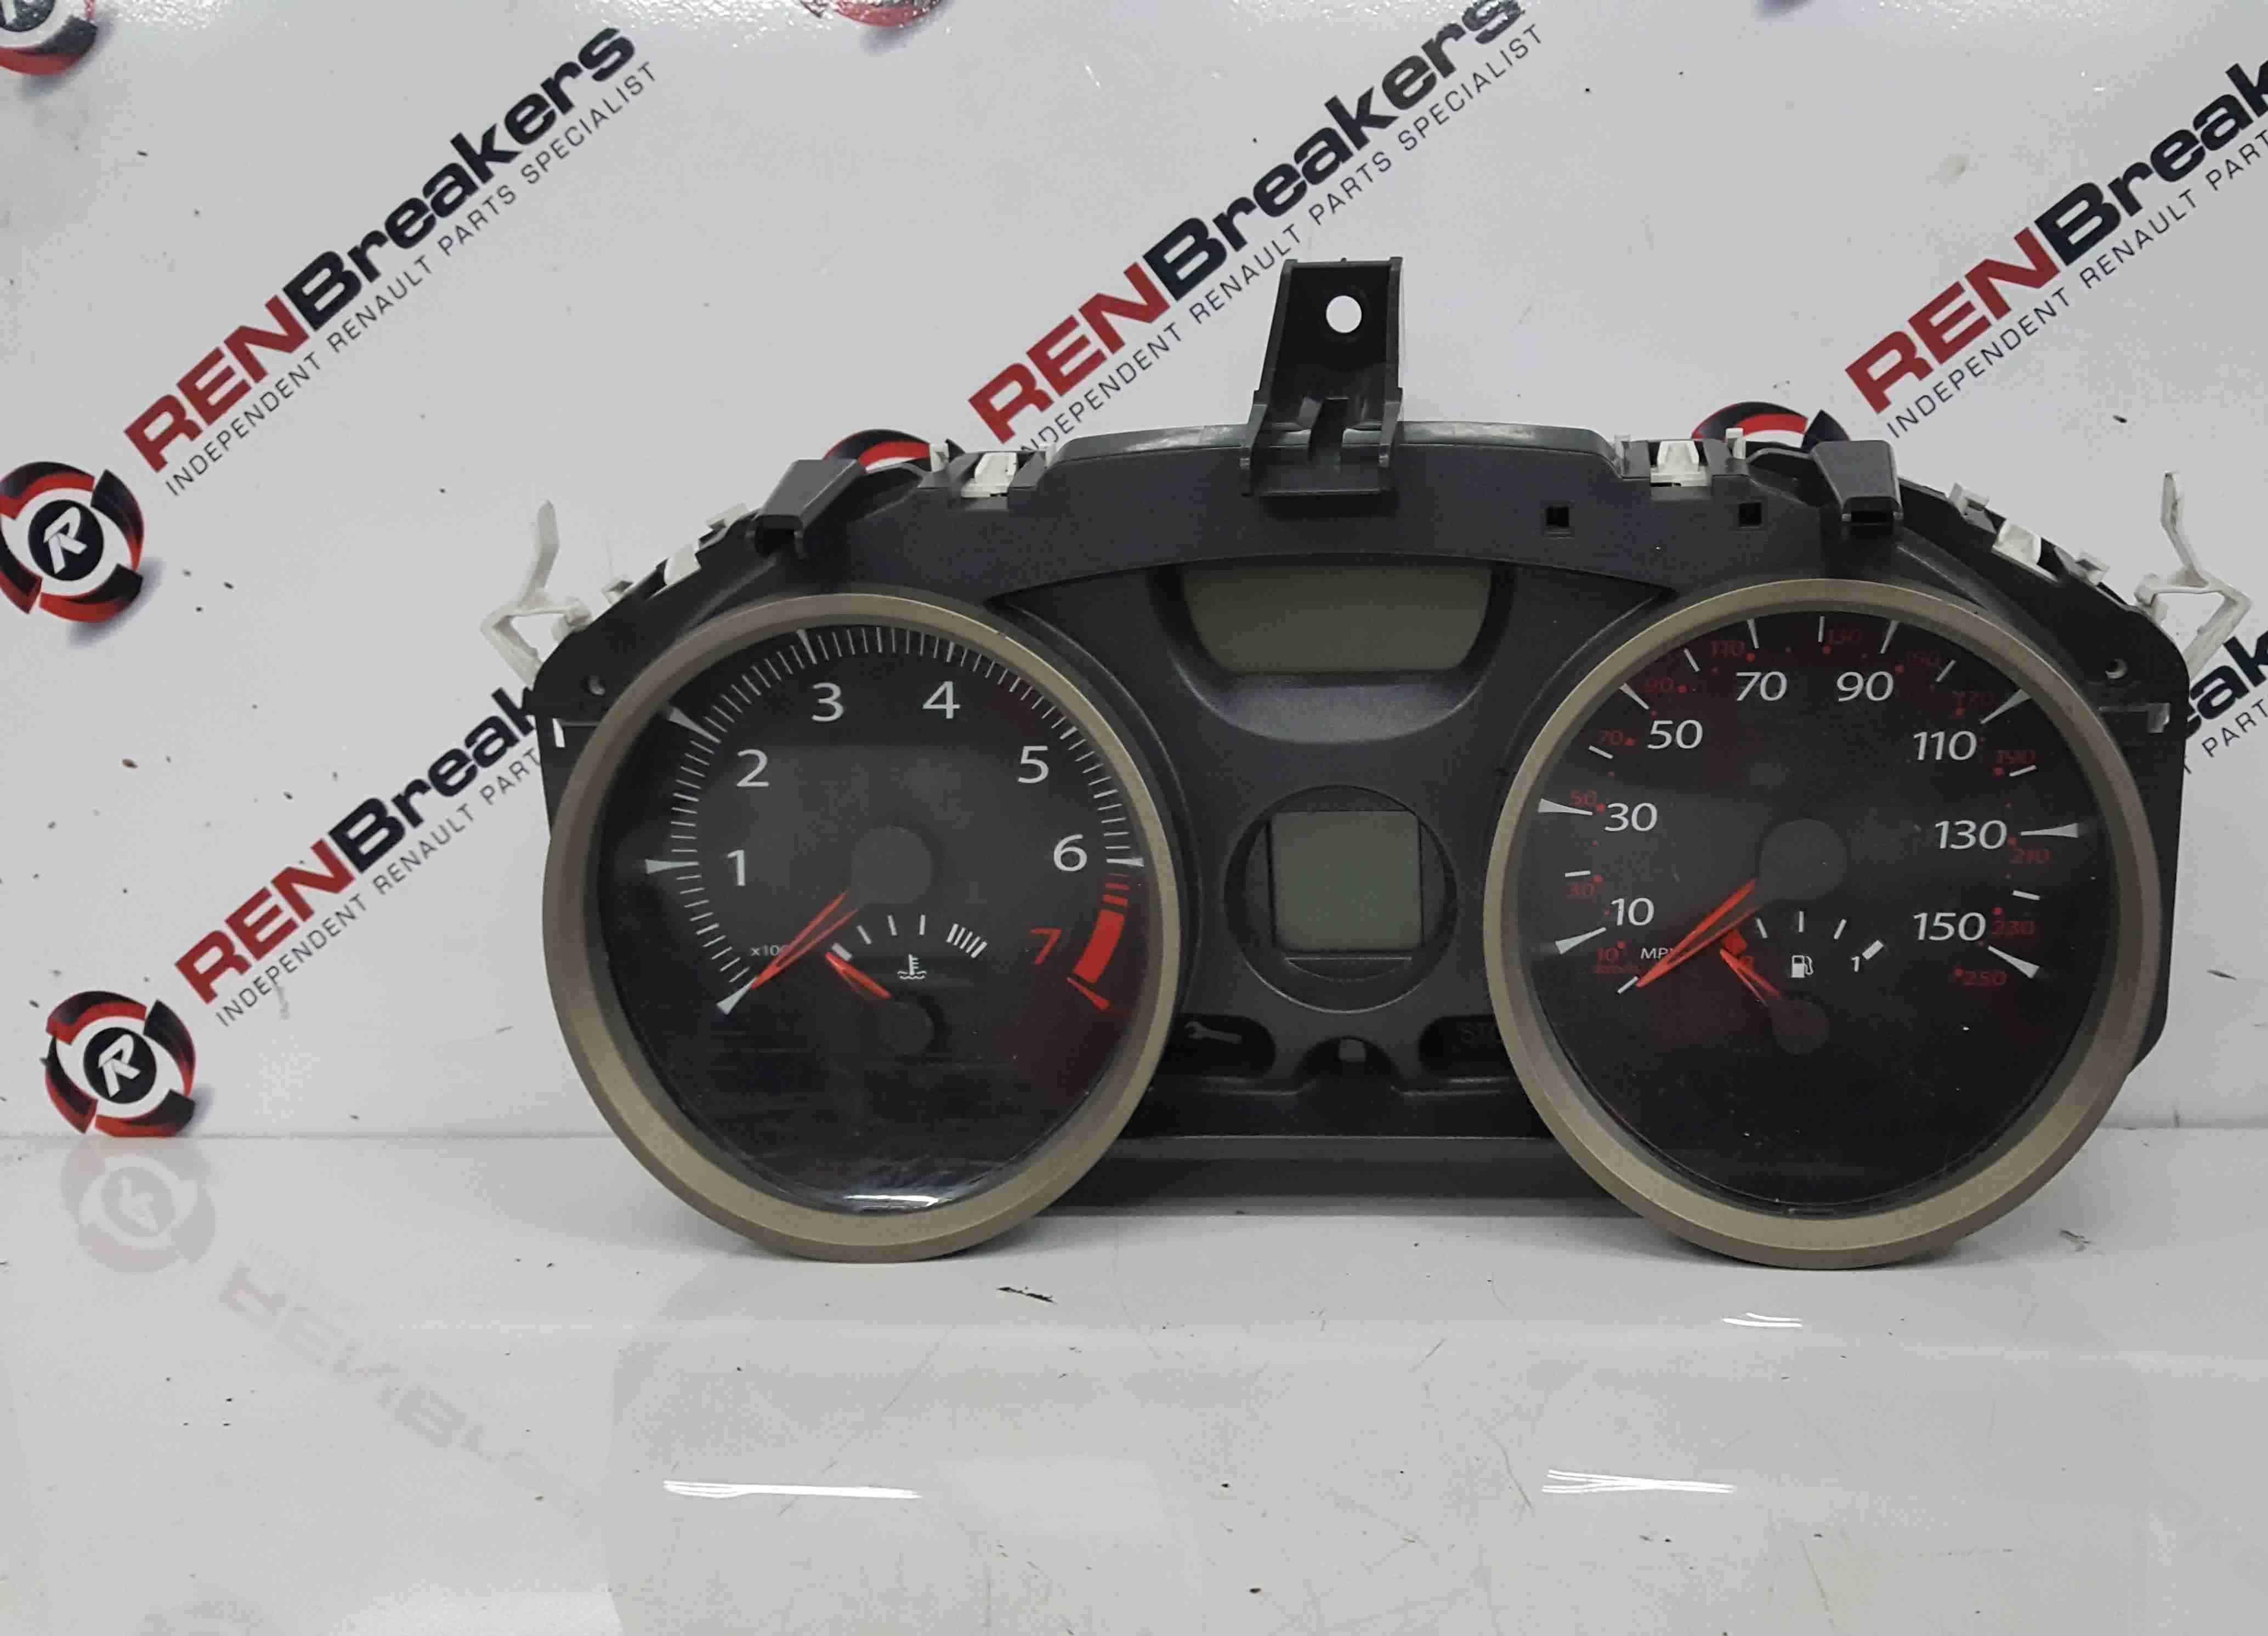 Renault Megane Convertible 2002-2008 Instrument Panel Dials Clocks 59K